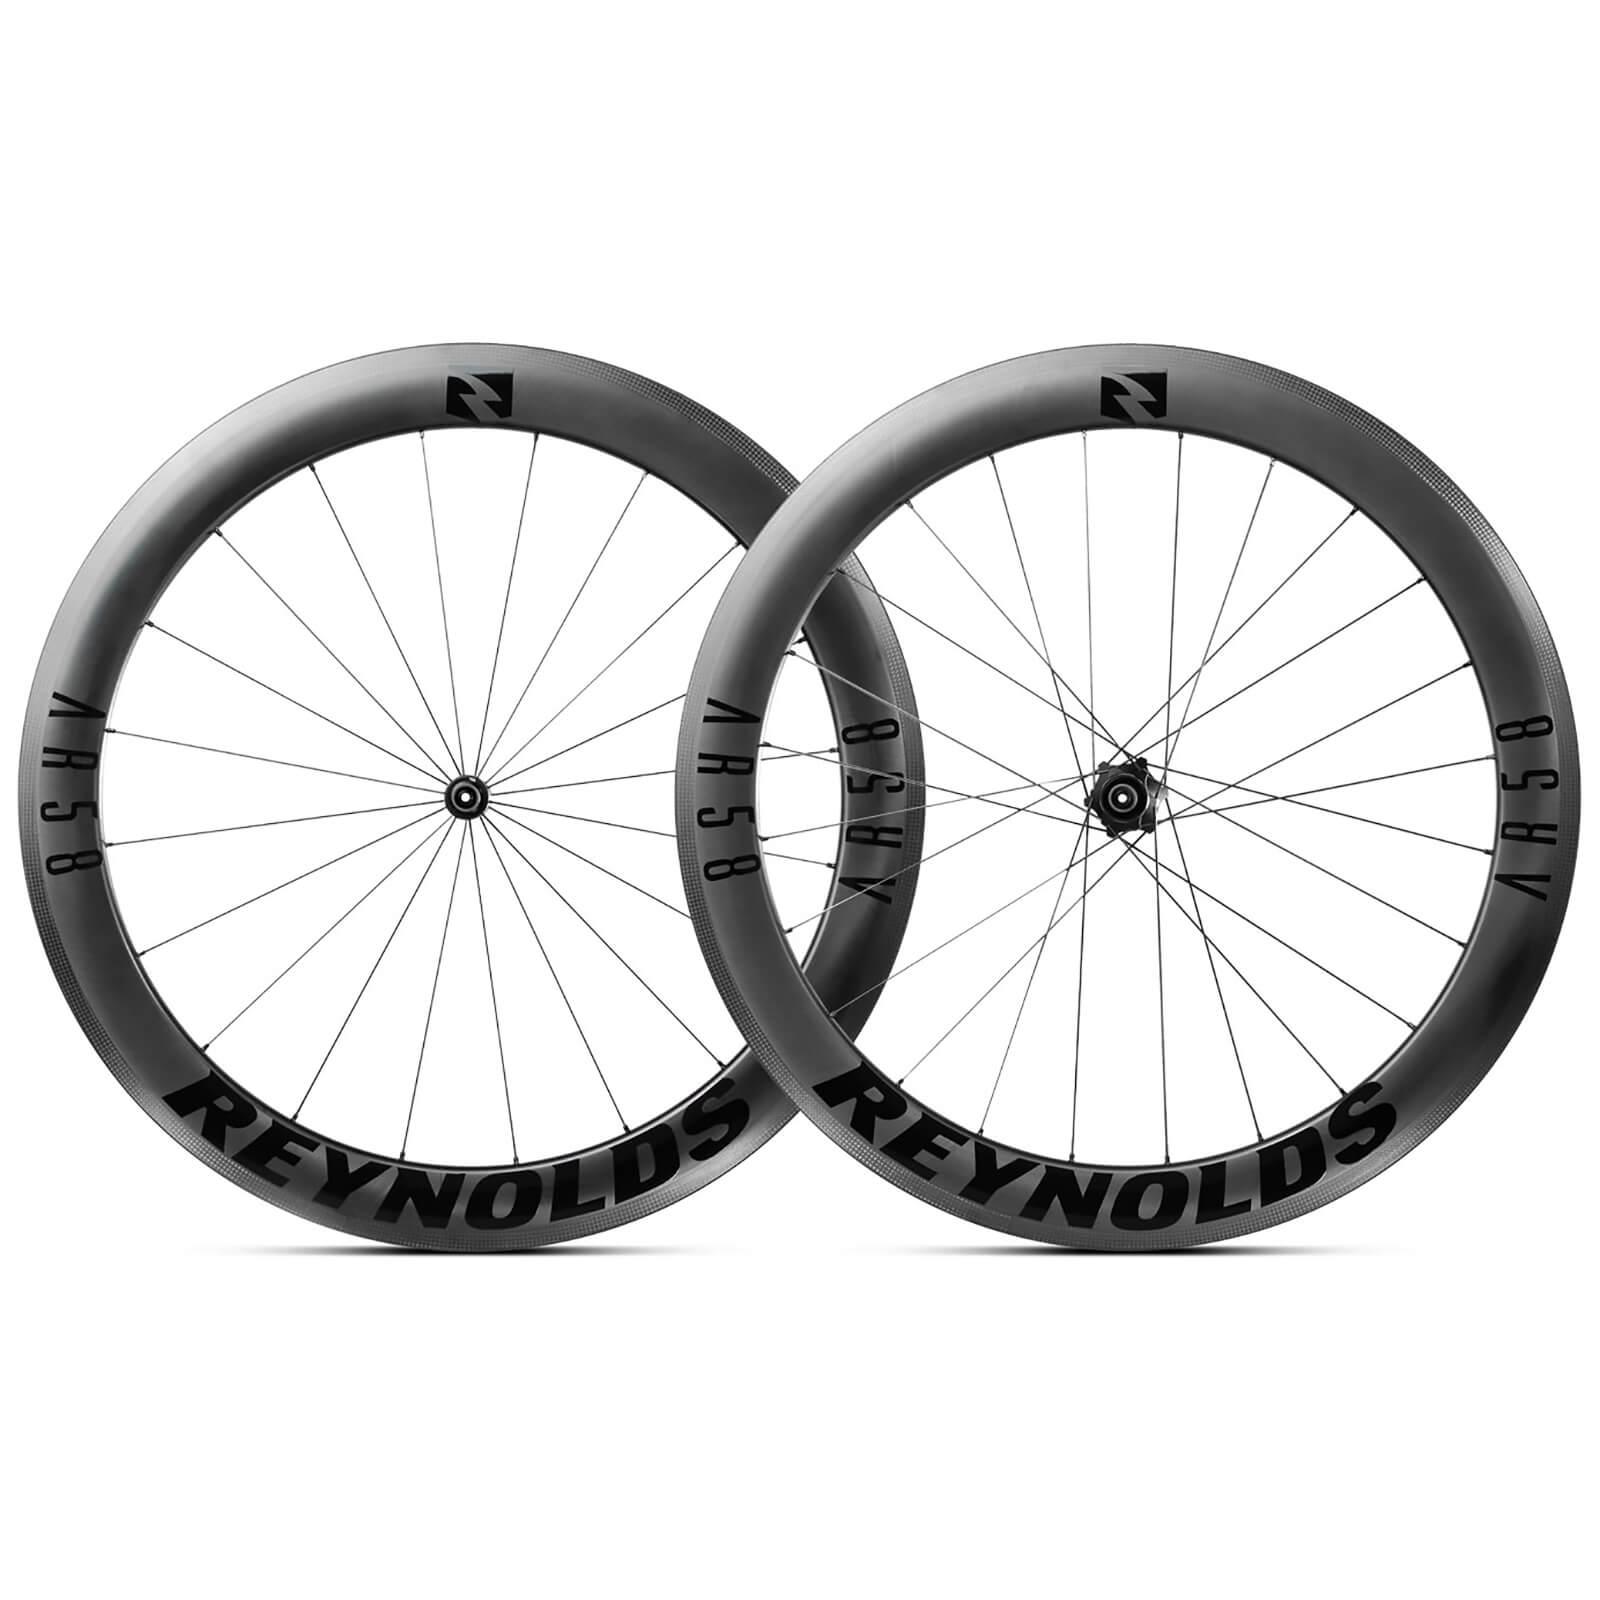 db0612c2957 Reynolds AR 58 Carbon Clincher Wheelset 2019 | ProBikeKit UK